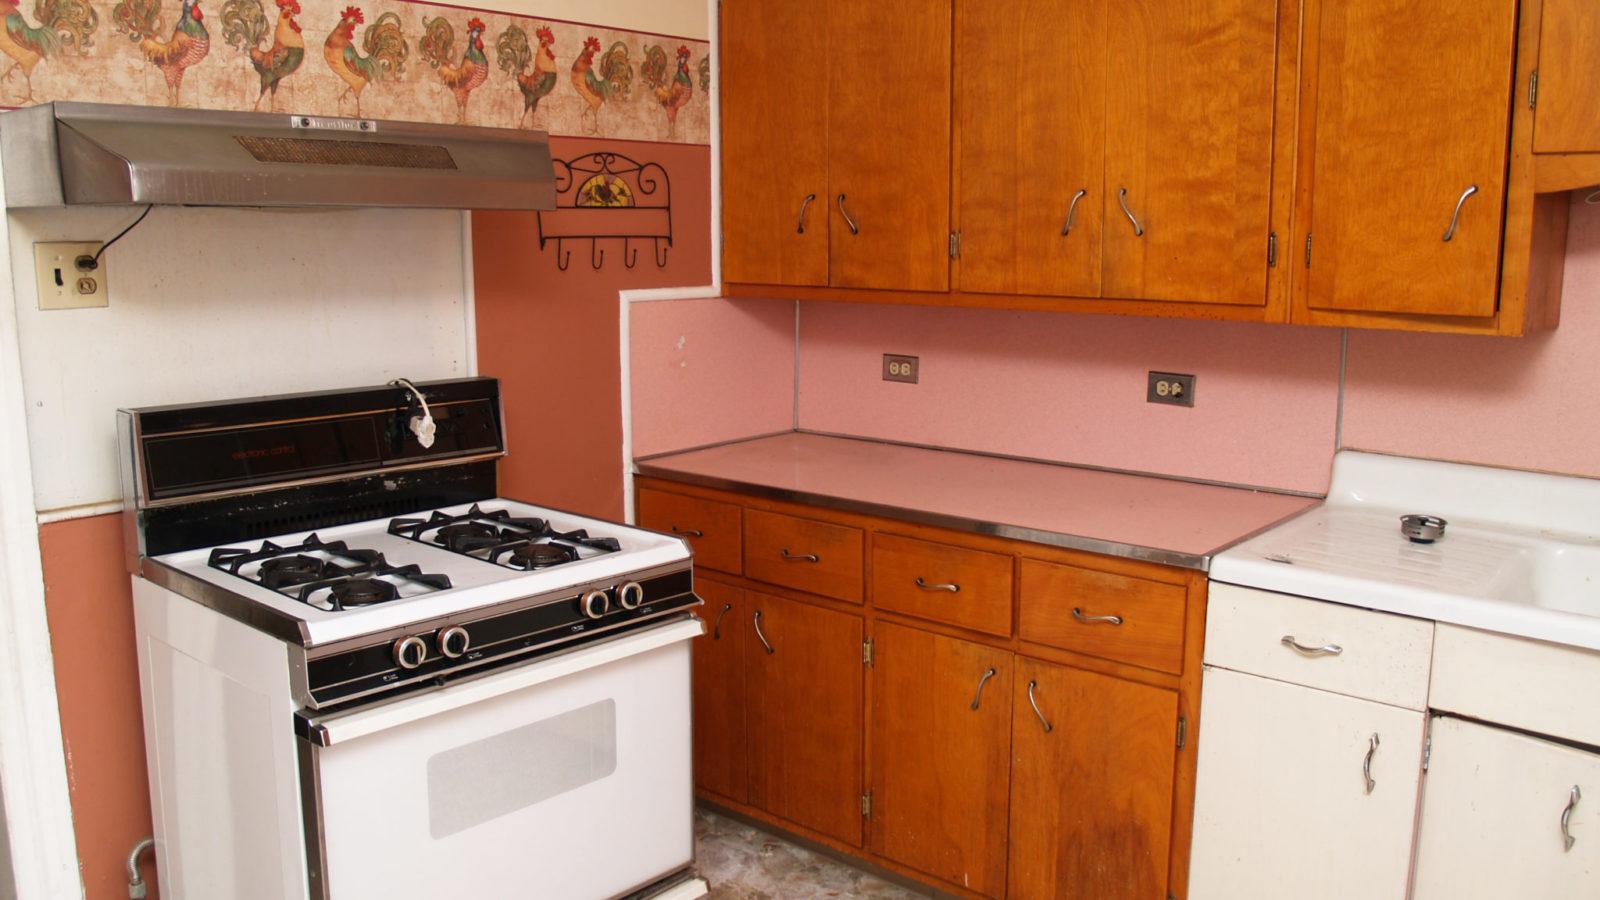 Old kitchen with pink backsplash and wallpaper border